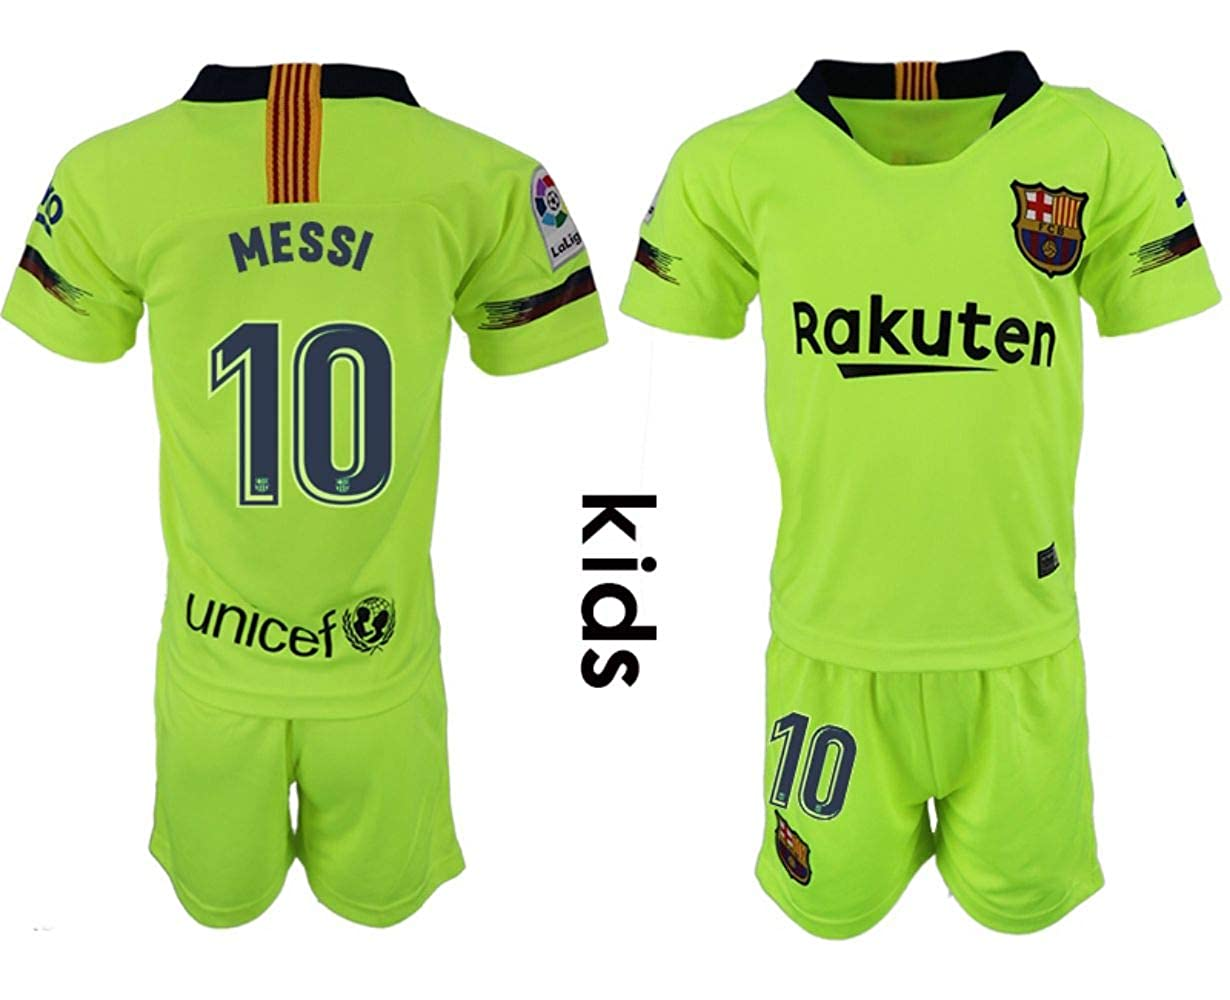 2018-2019 New Barcelona Messi Kid's Soccer Jersey